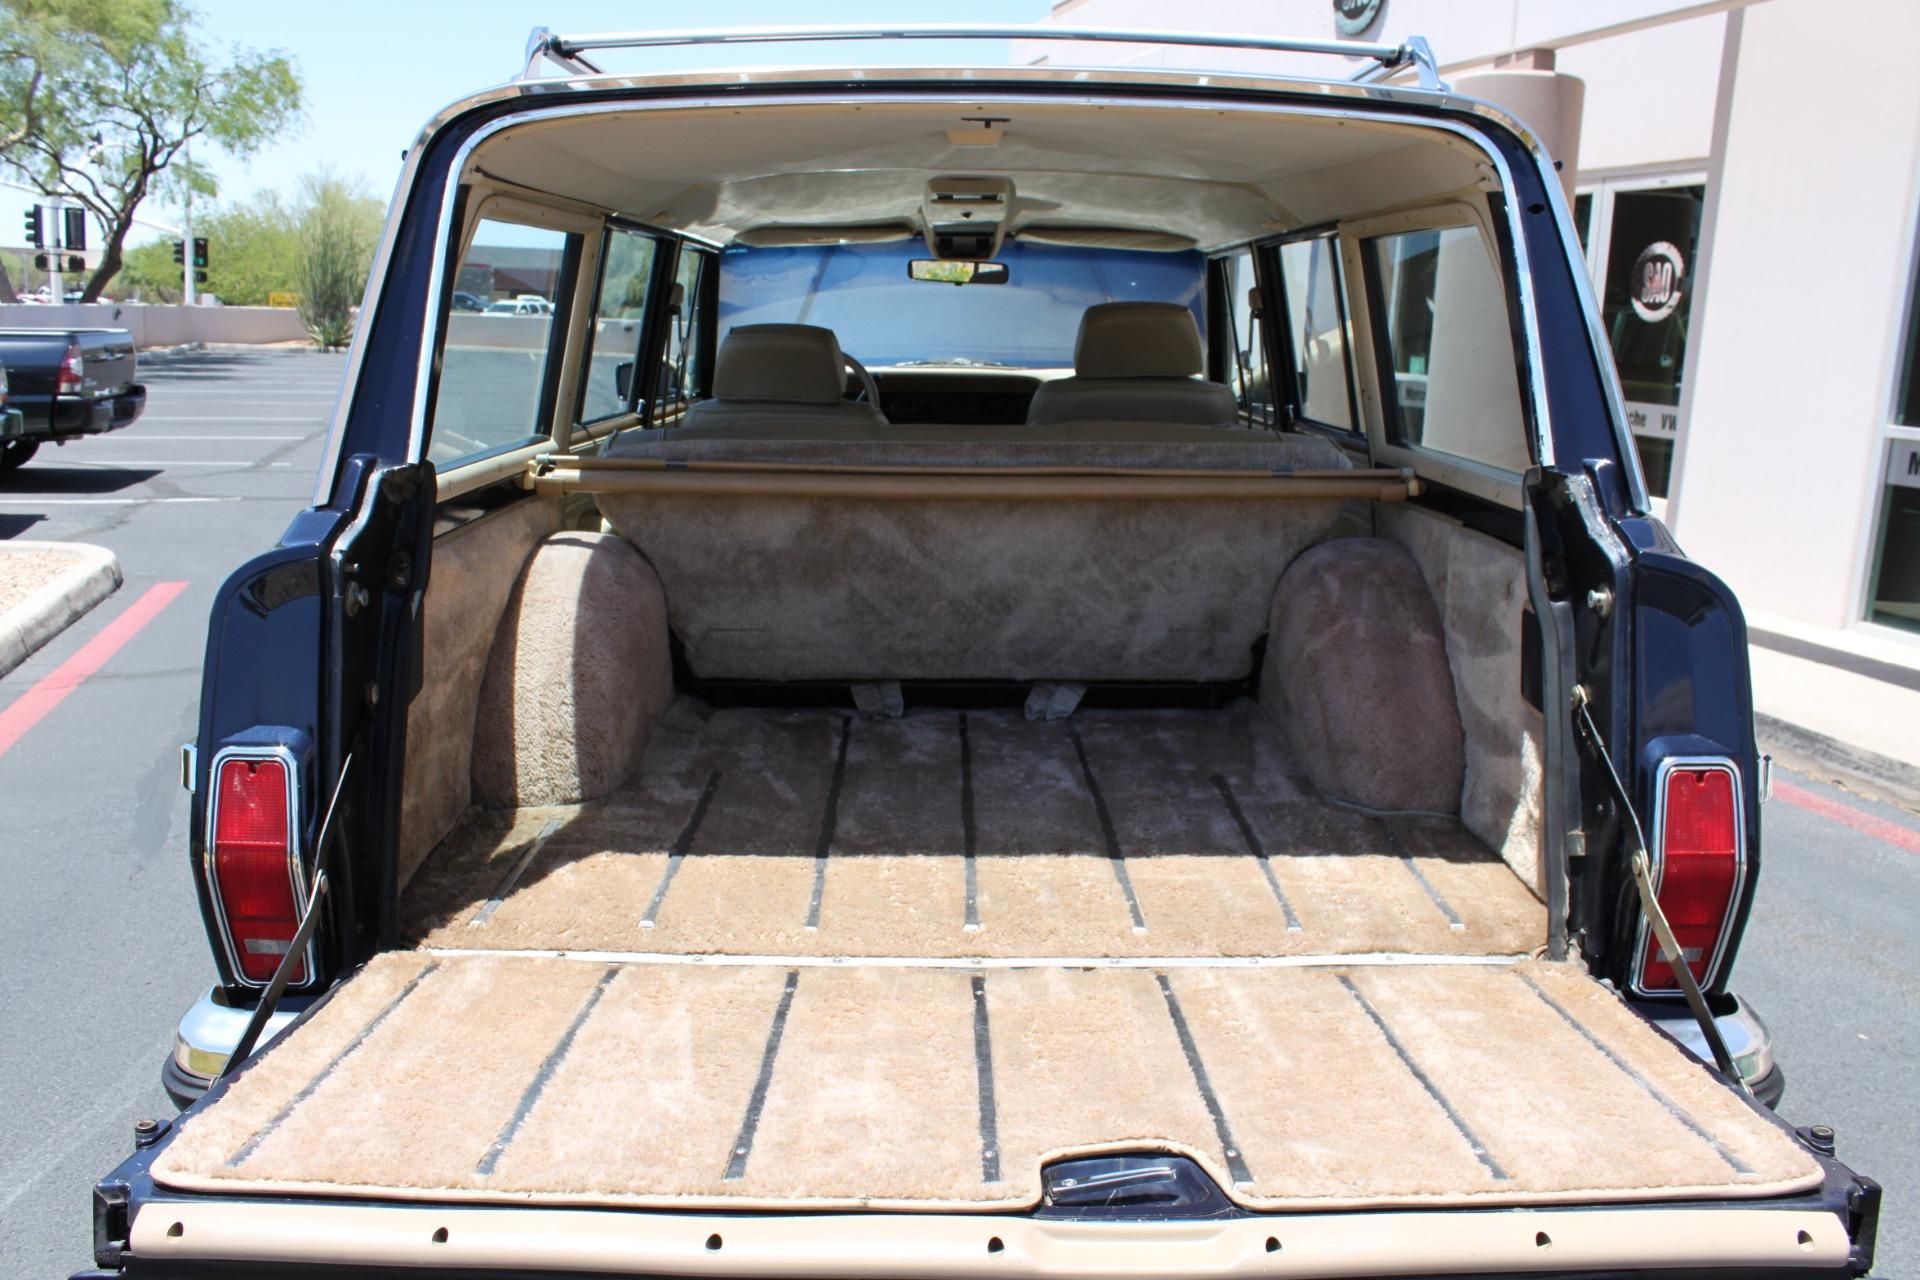 Used-1990-Jeep-Grand-Wagoneer-4X4-Toyota